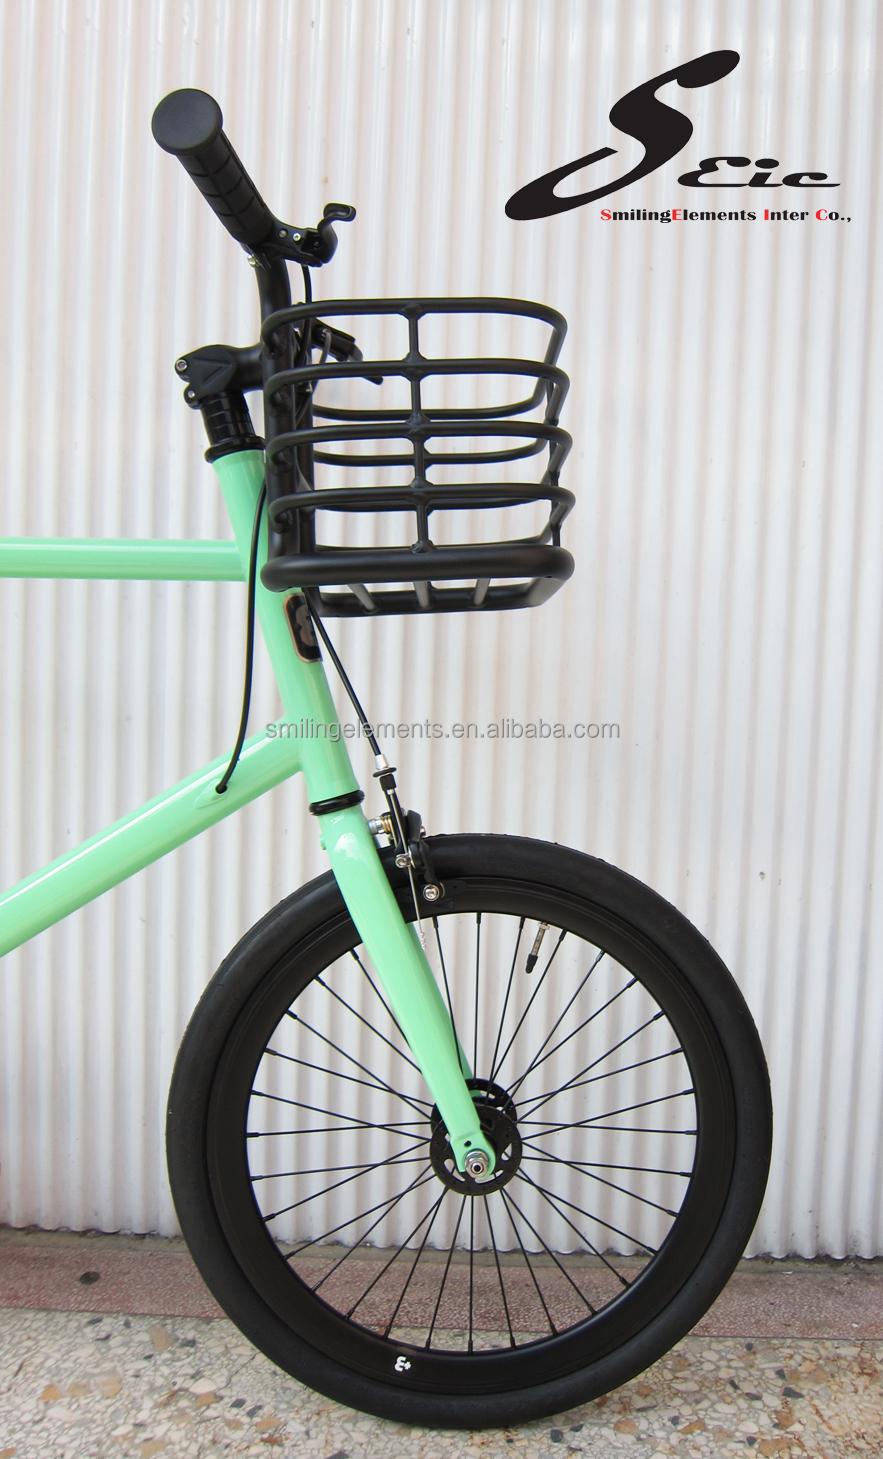 hellgr n 20 zoll mini fixie fahrrad mit korb lenker. Black Bedroom Furniture Sets. Home Design Ideas